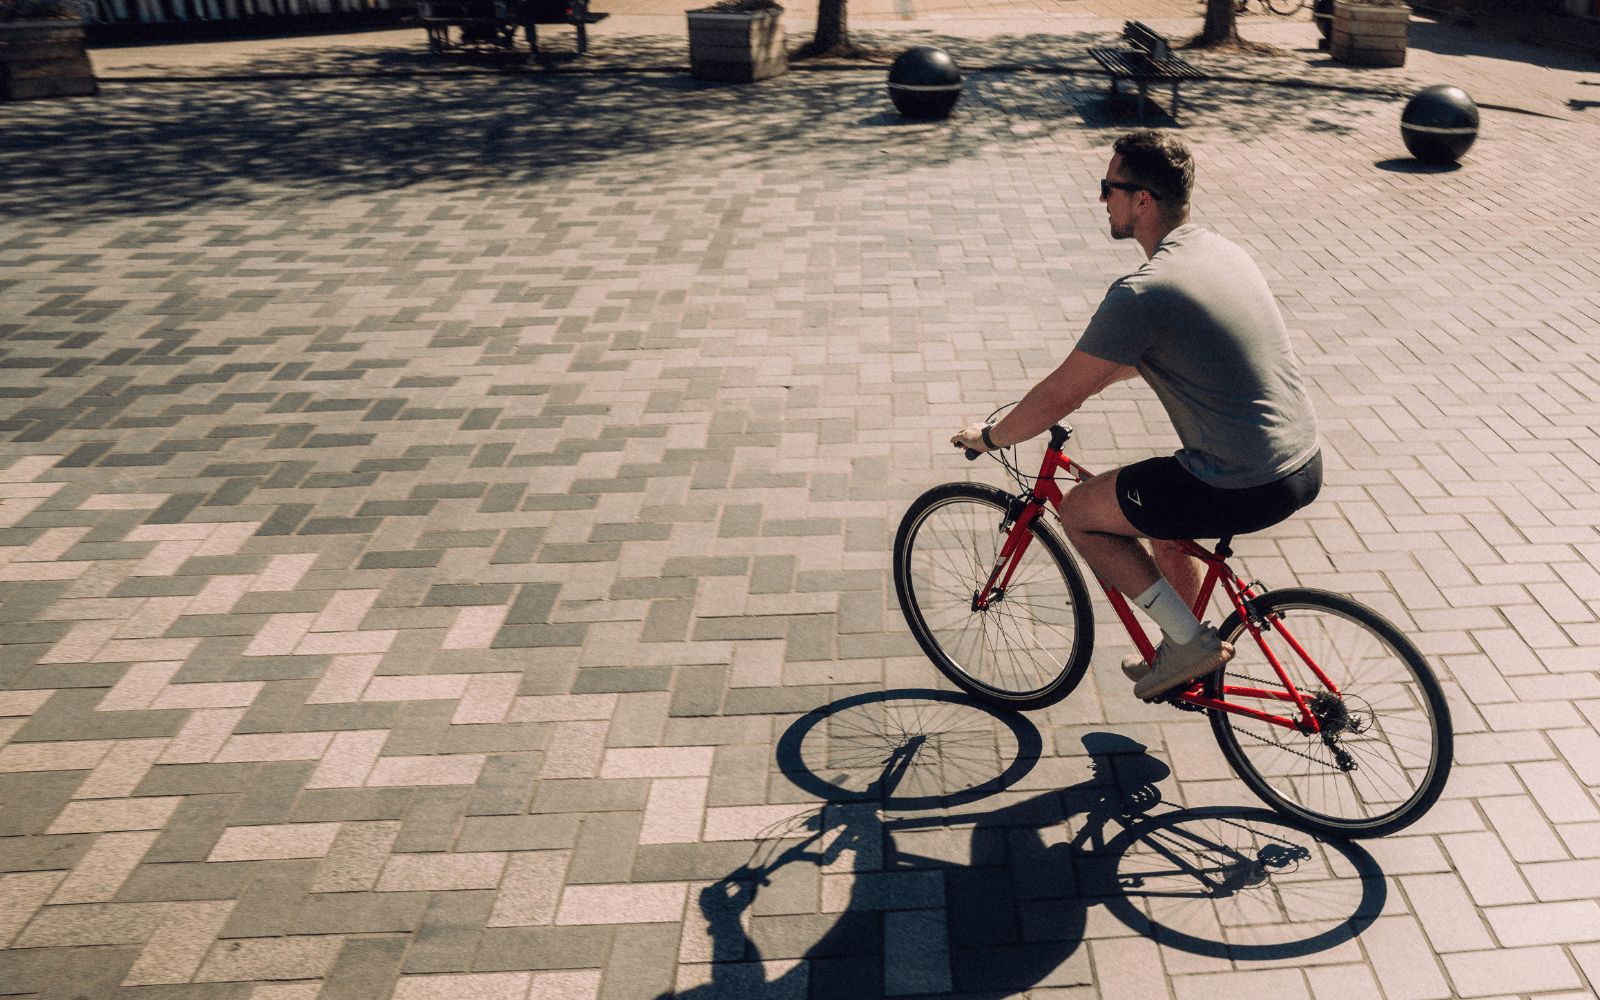 17 17 - Reid ® - Transit Bike